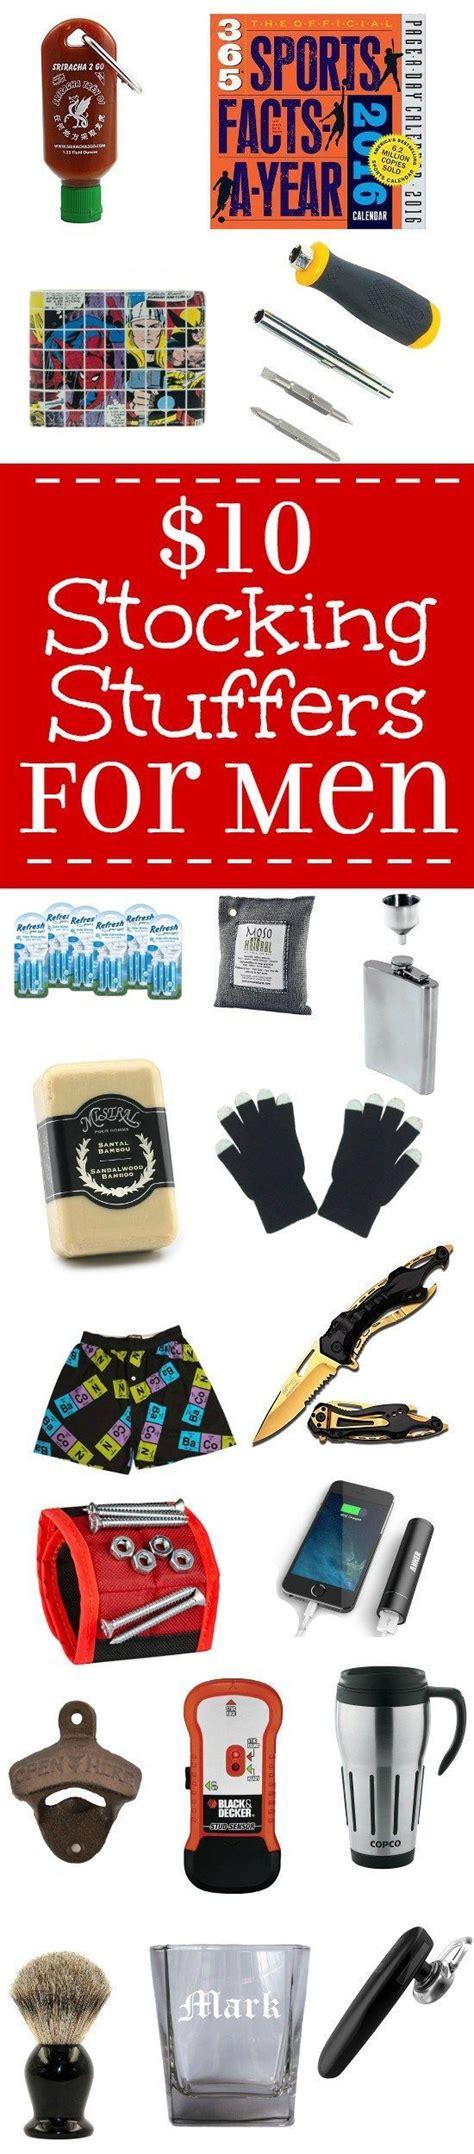 mens stocking stuffers 2016 10 stocking stuffer ideas for men stocking stuffers